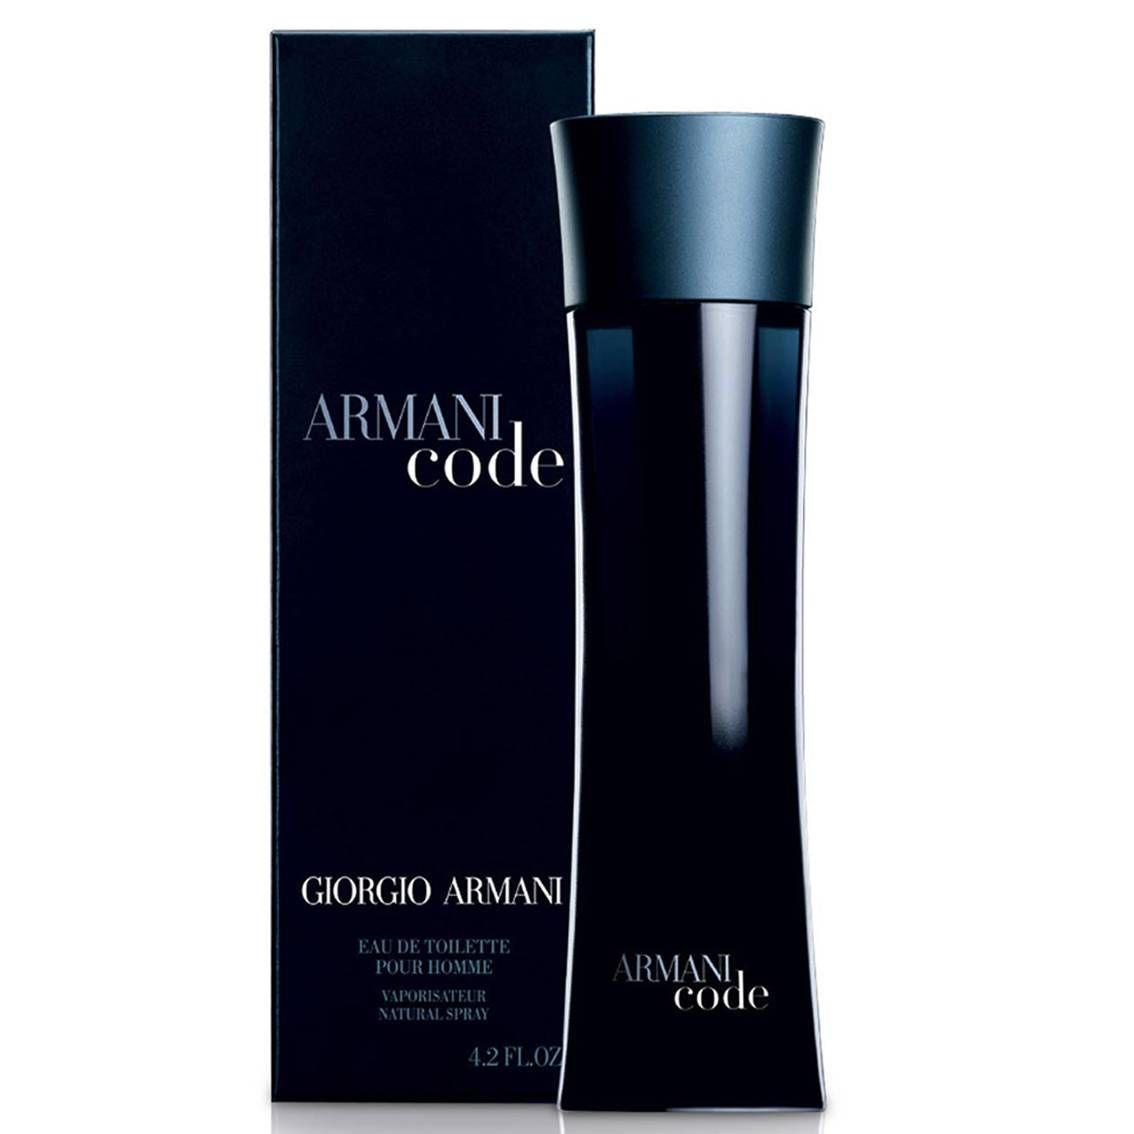 Perfume Importado Giorgio Armani - Eau de Toilette